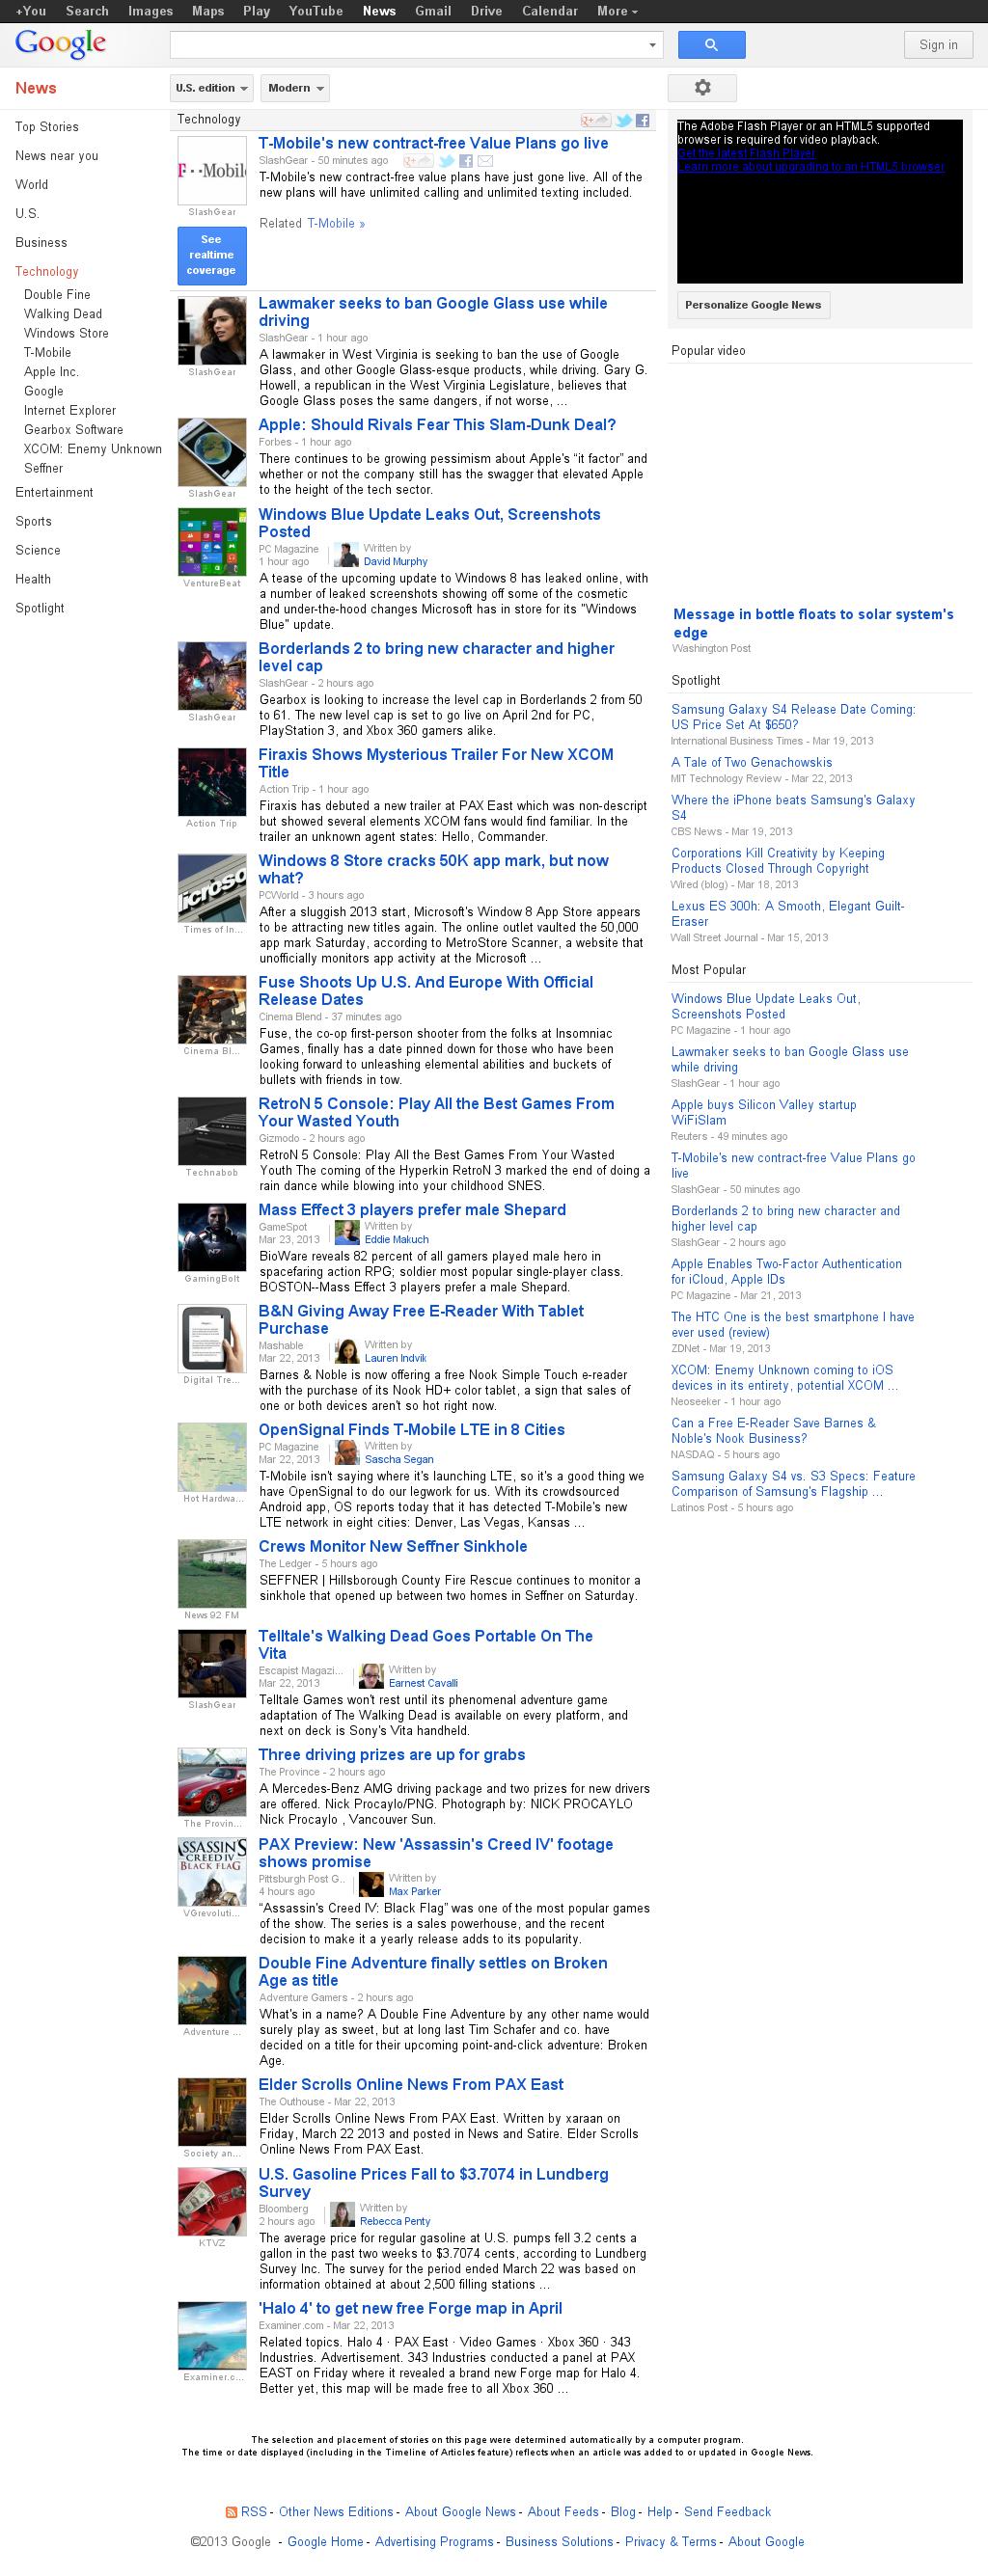 Google News: Technology at Sunday March 24, 2013, 9:15 p.m. UTC